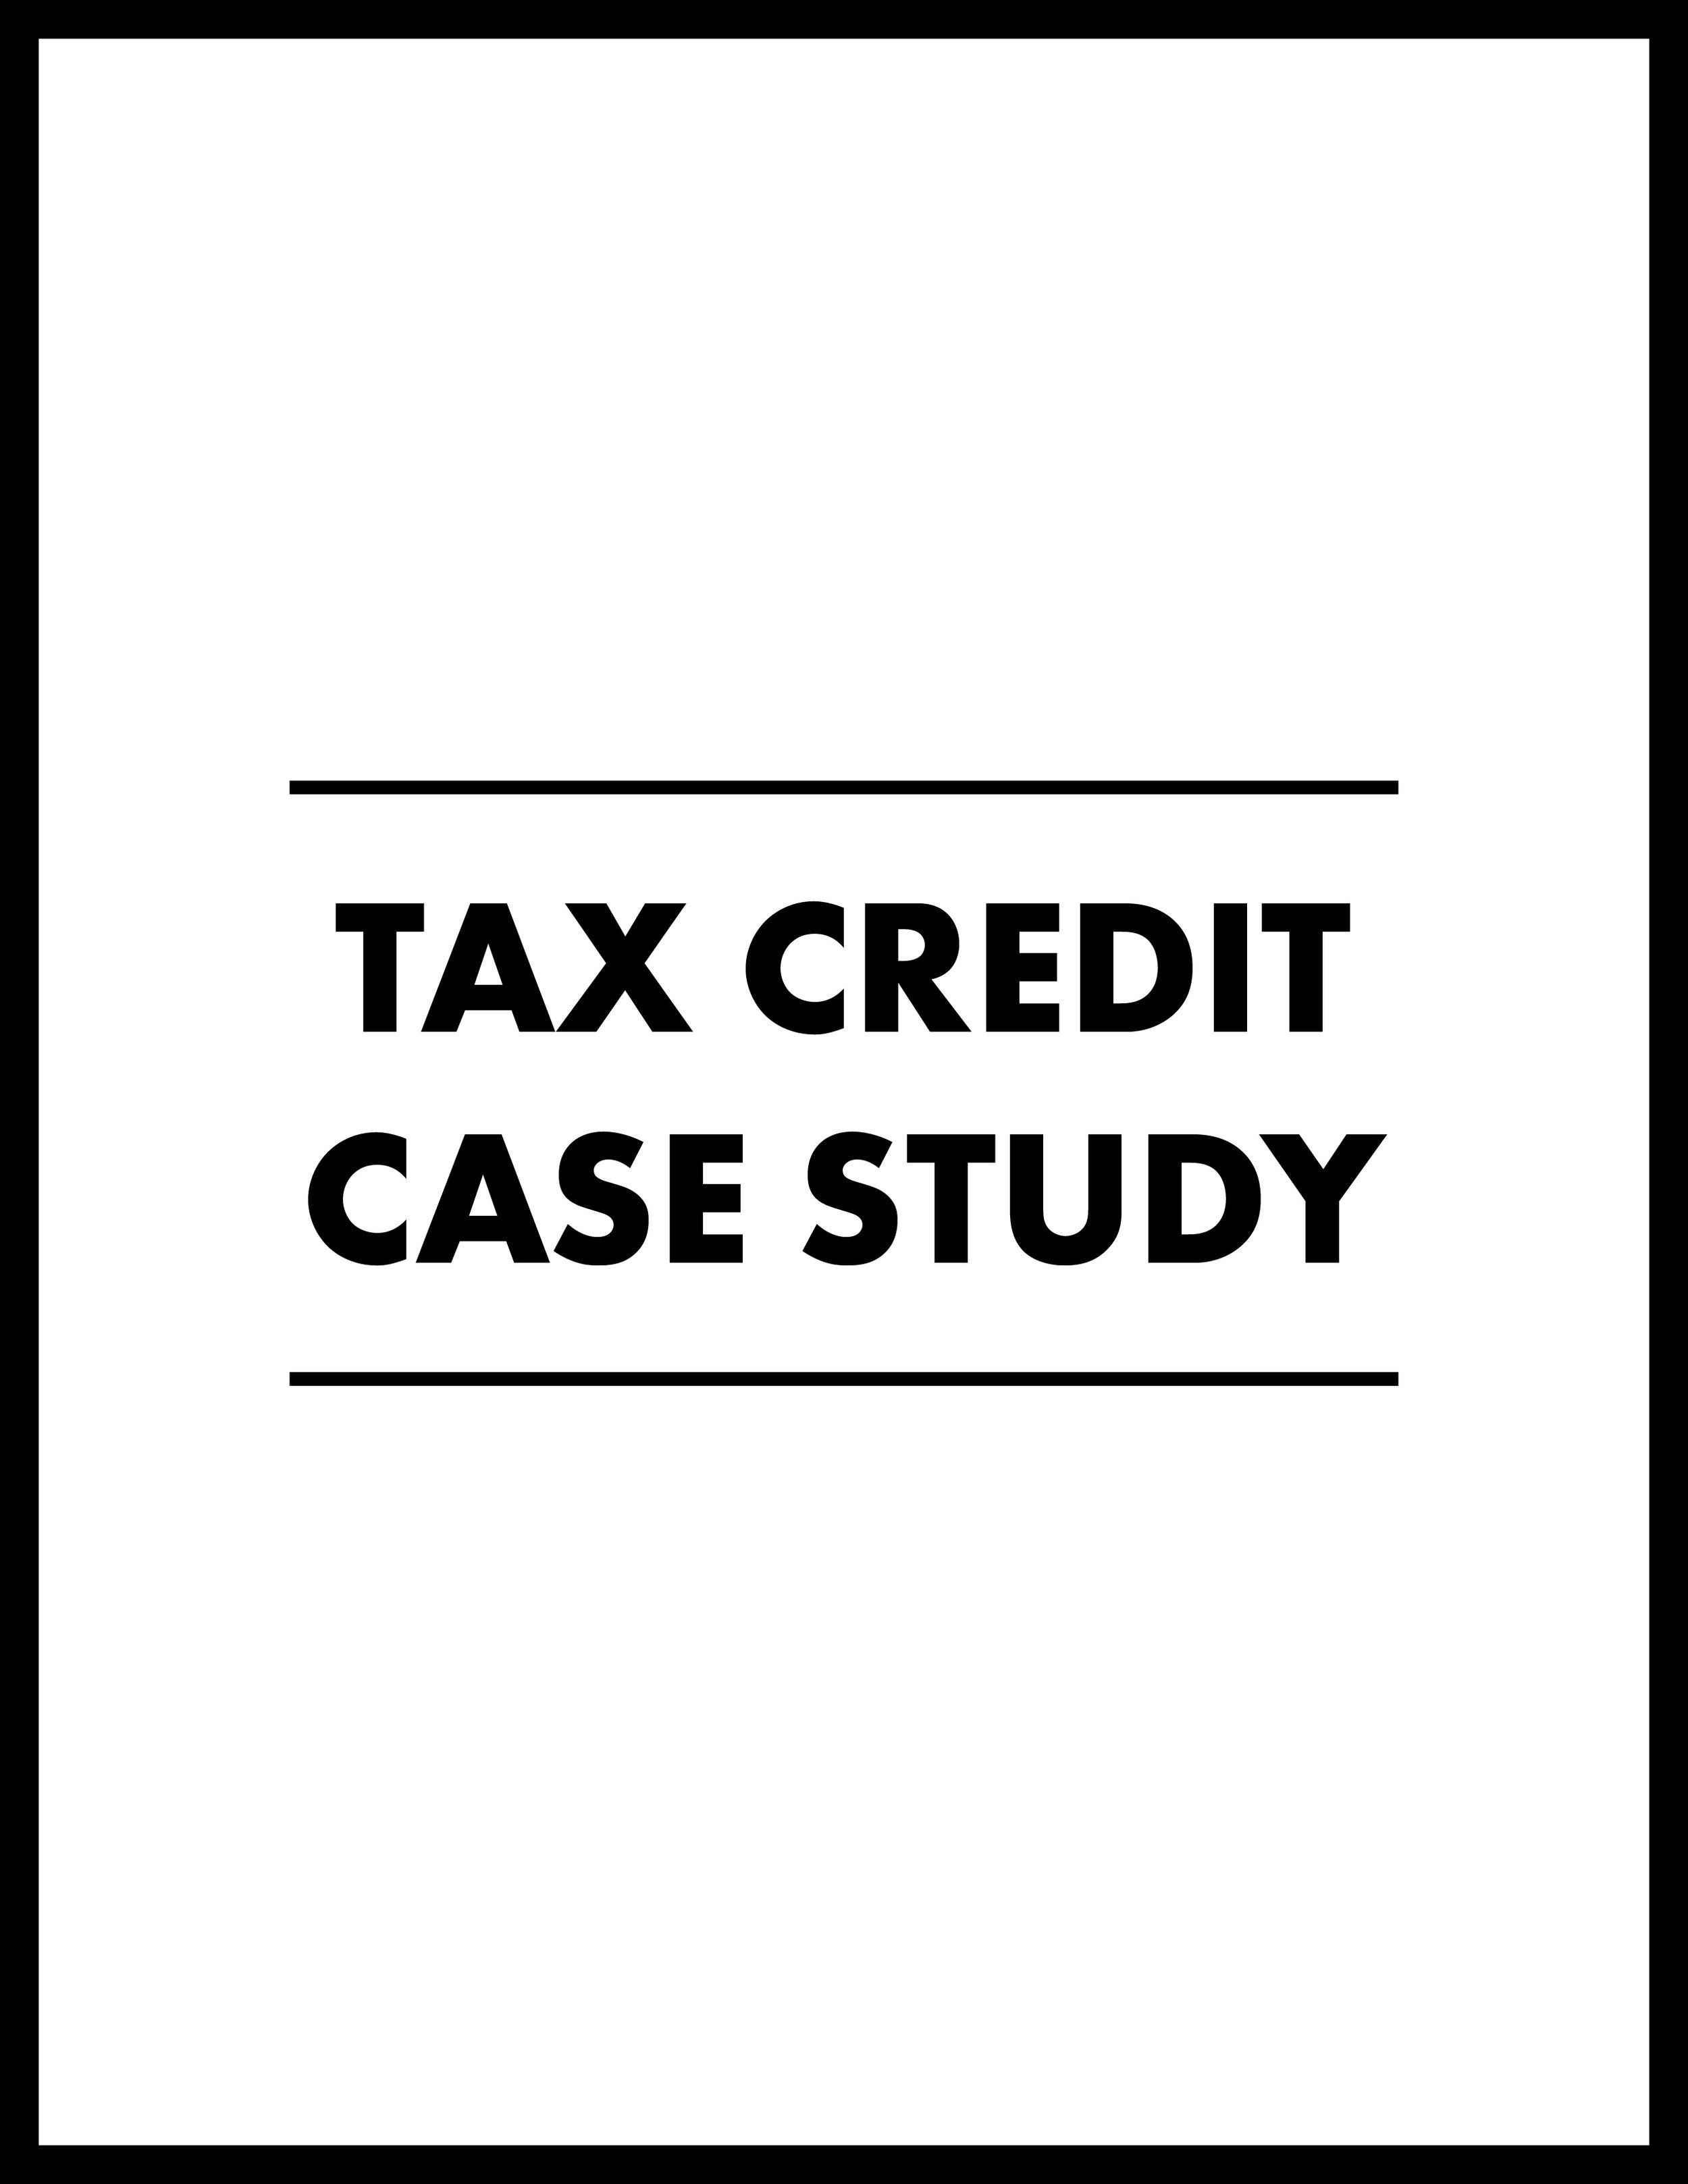 Tax Credit Case Study-01.jpg